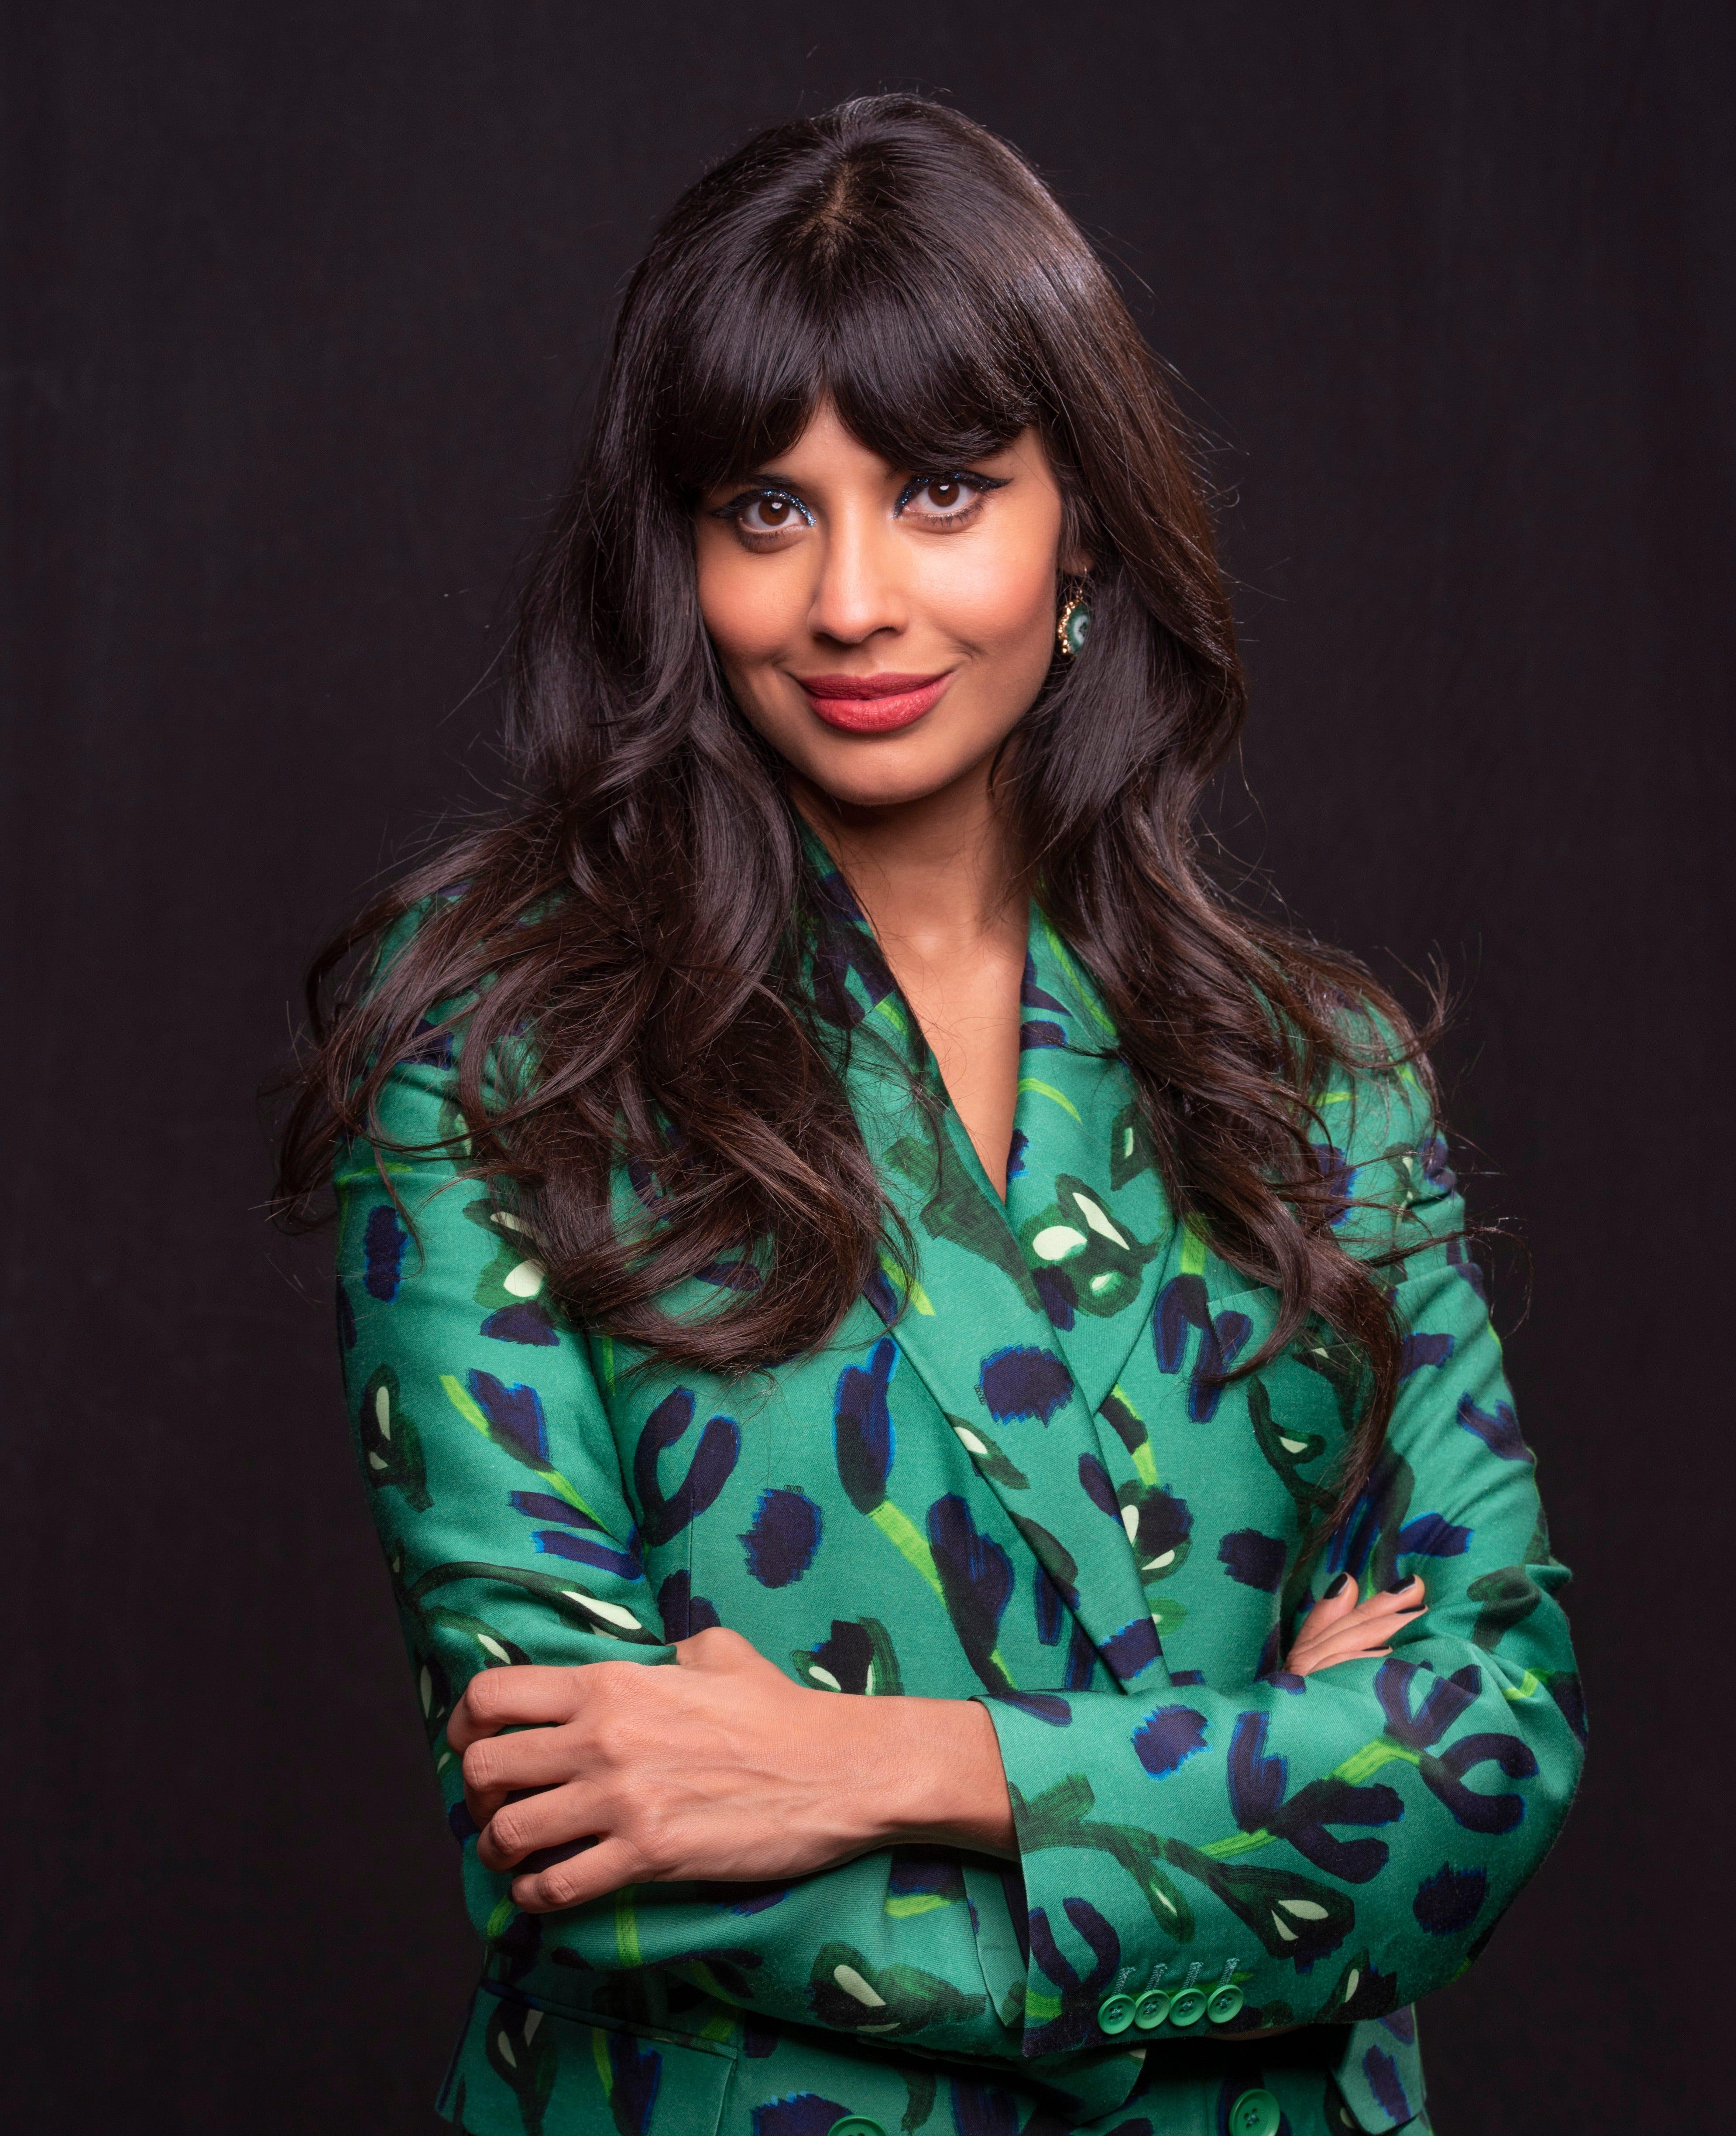 Good Place  star Jameela Jamil  almost threw up on camera  hosting  Misery Index